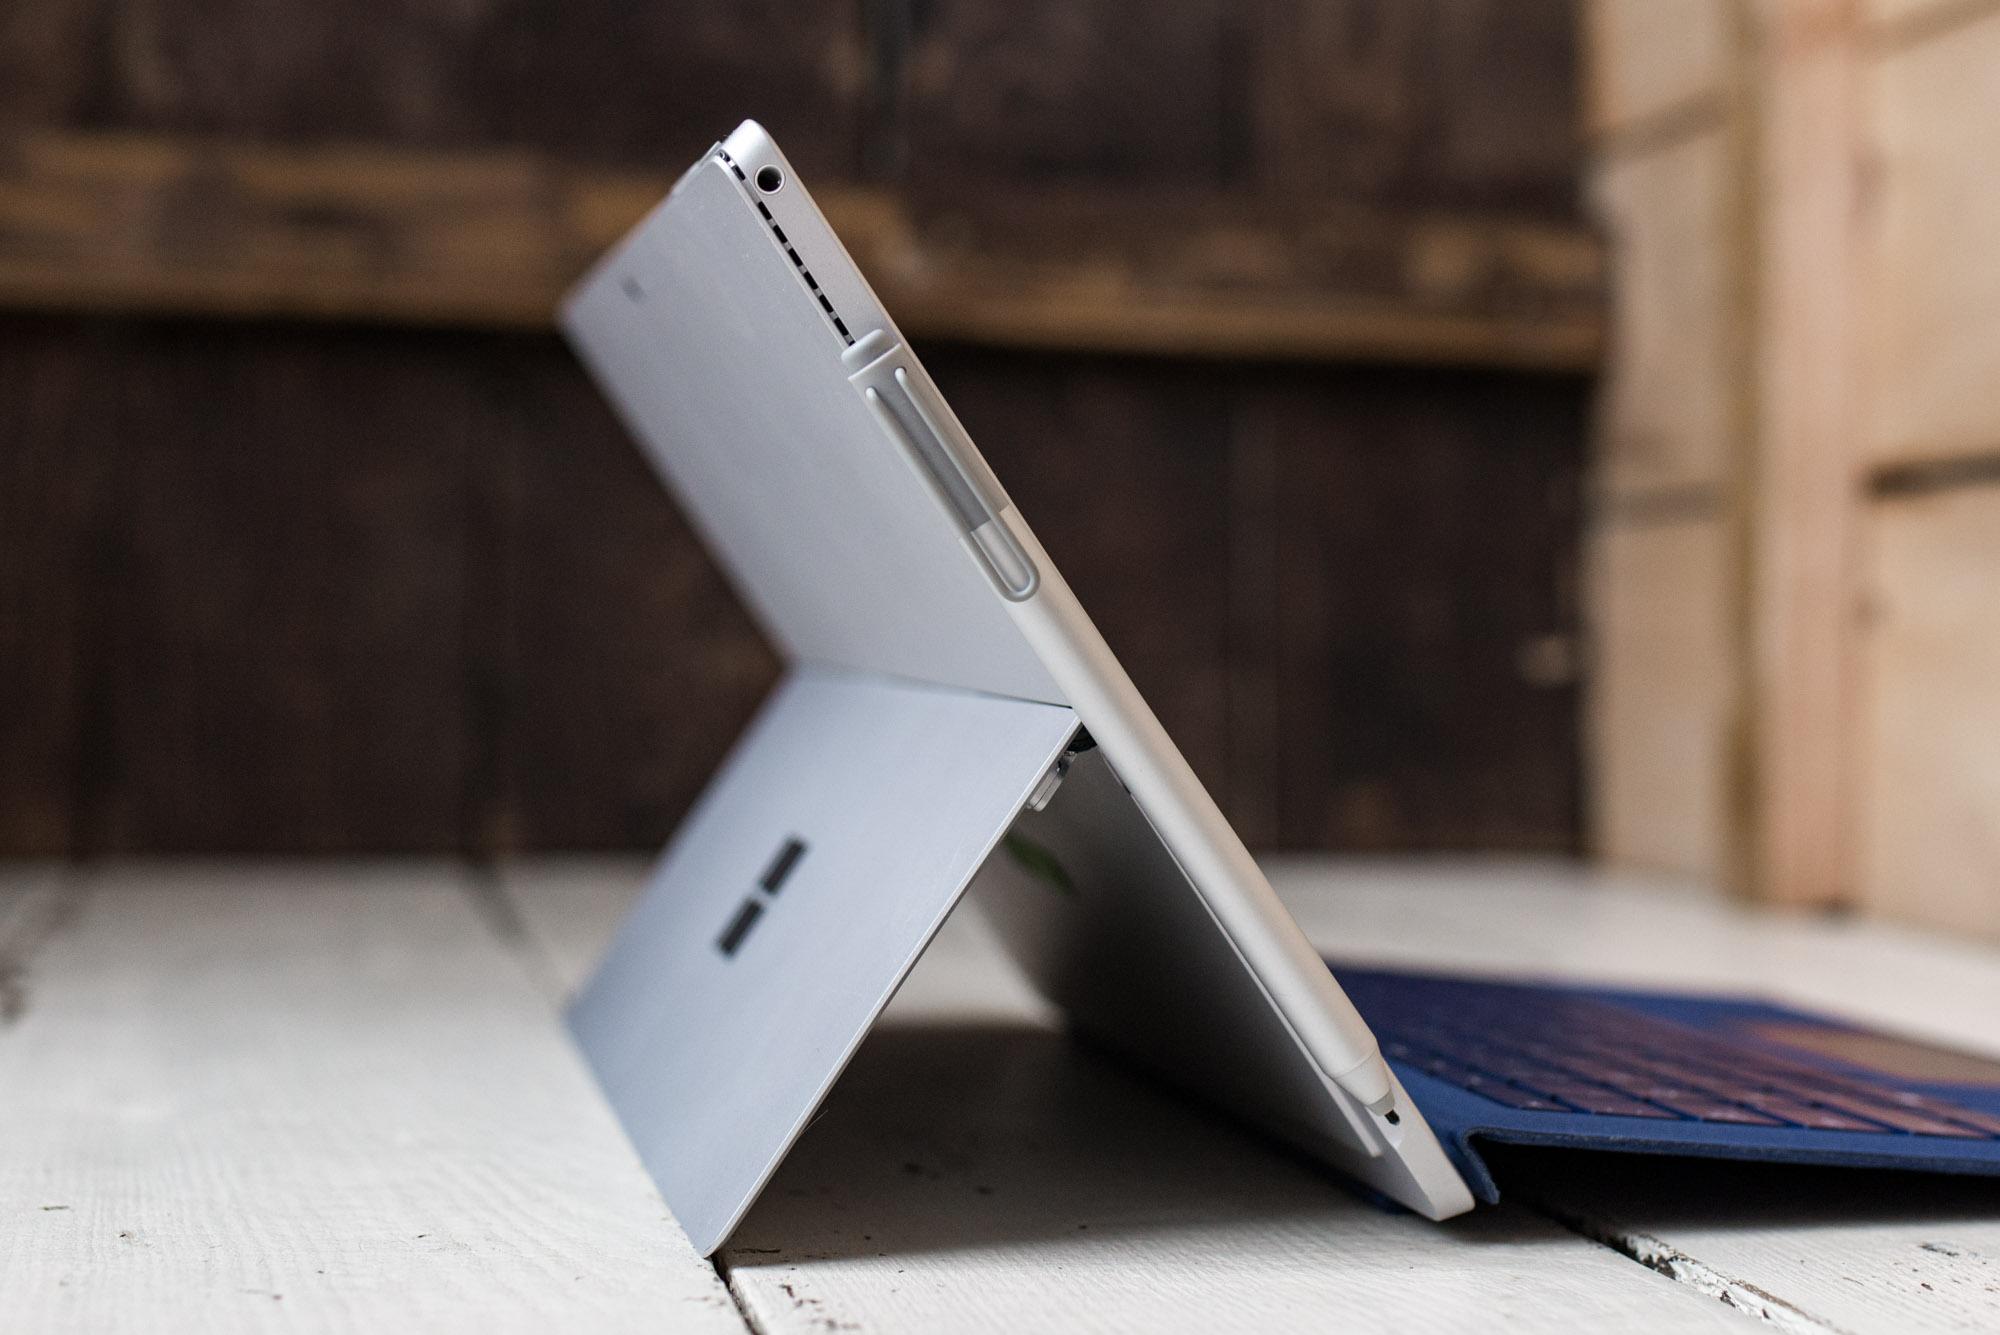 Surface-Pro-4-LK-3